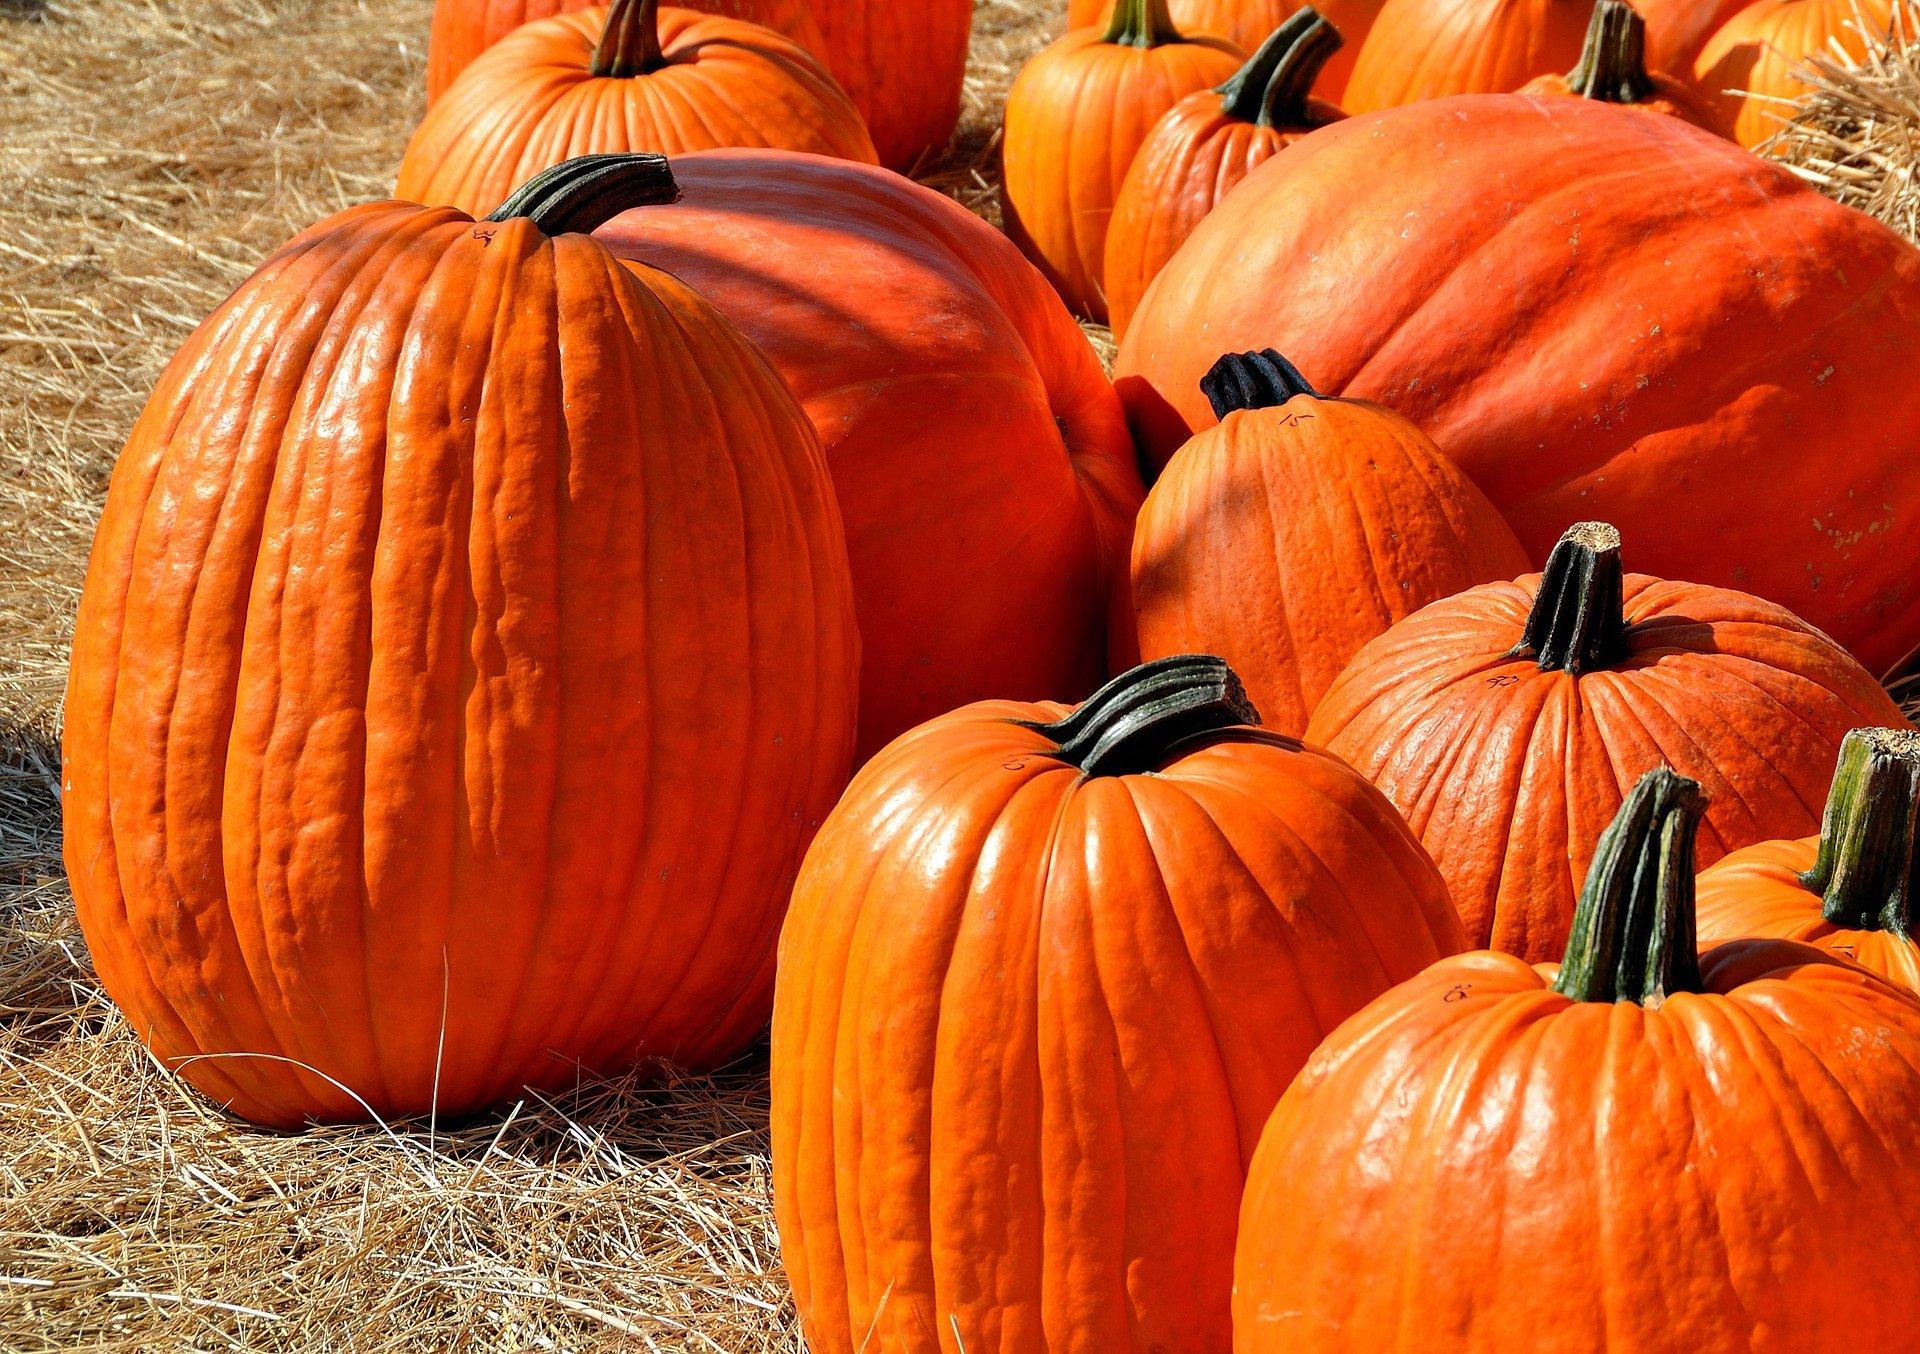 Pumpkin Growing Tips for next Halloween